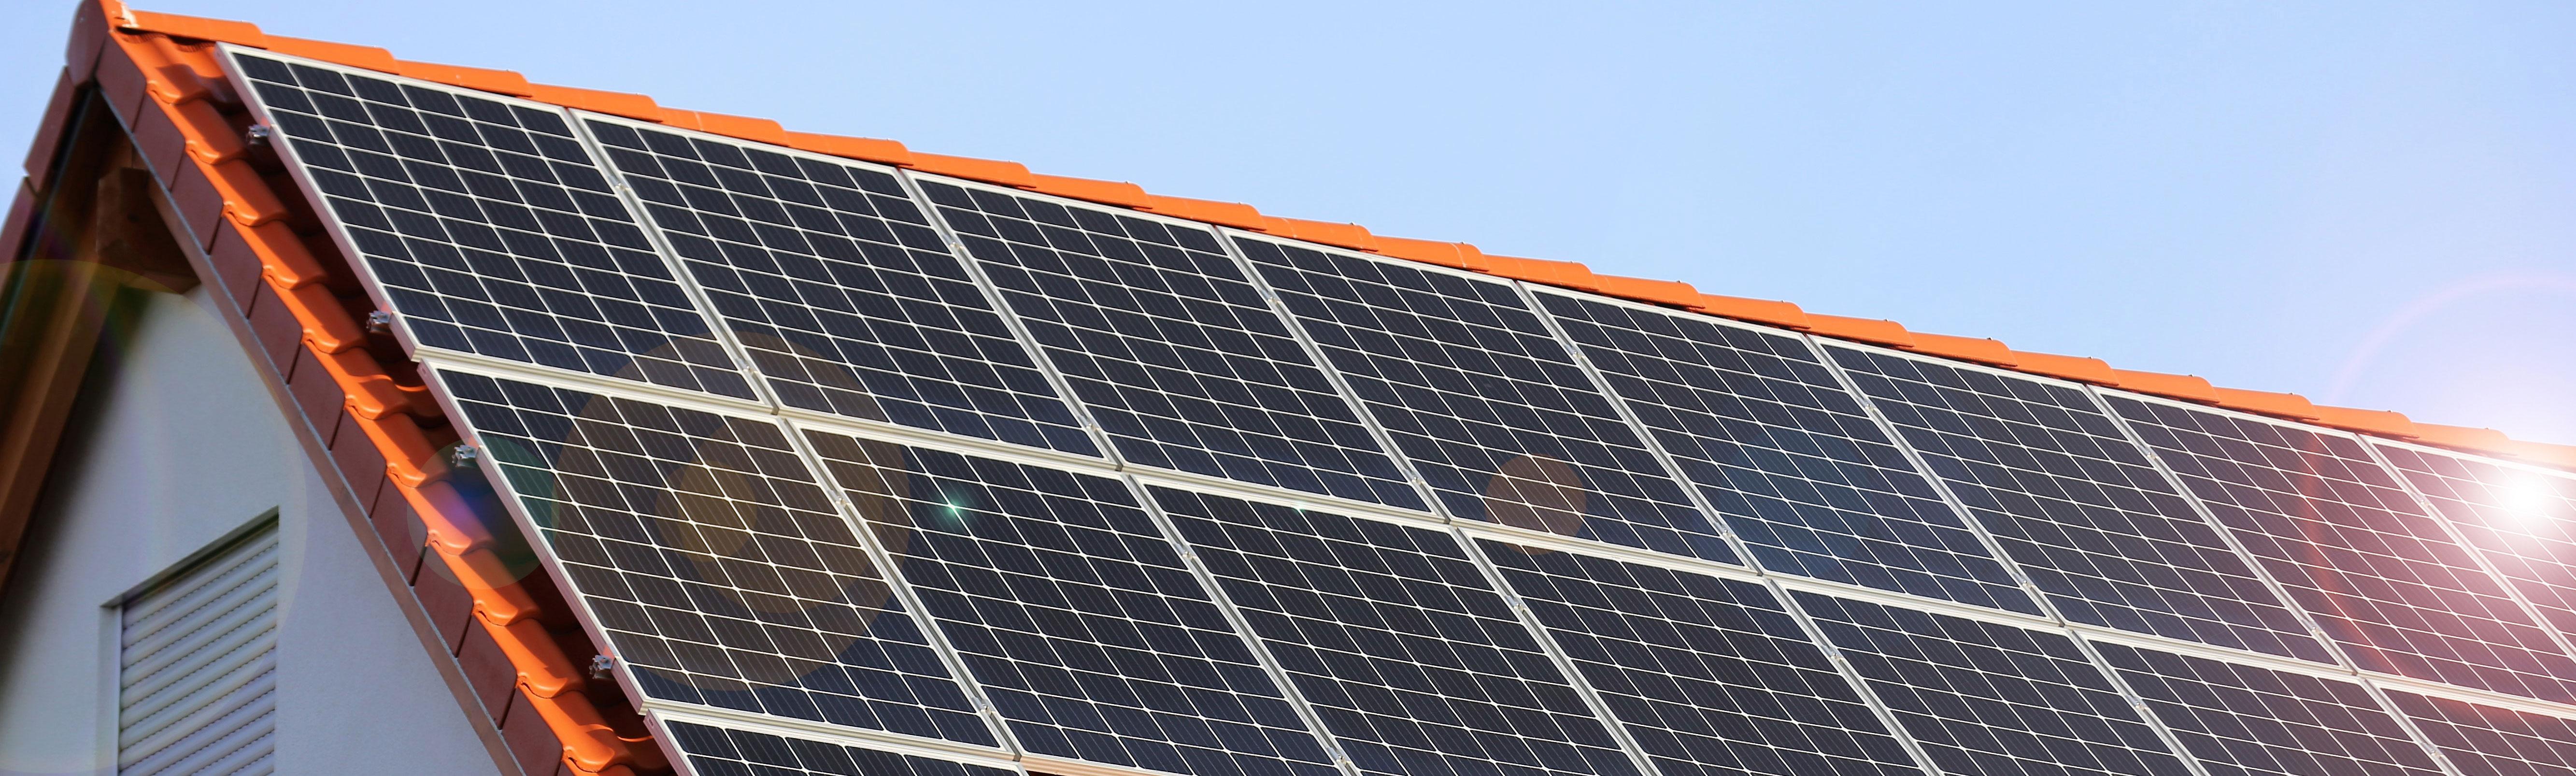 Photovoltaik und Batteriespeicher   Universitätsstadt Tübingen